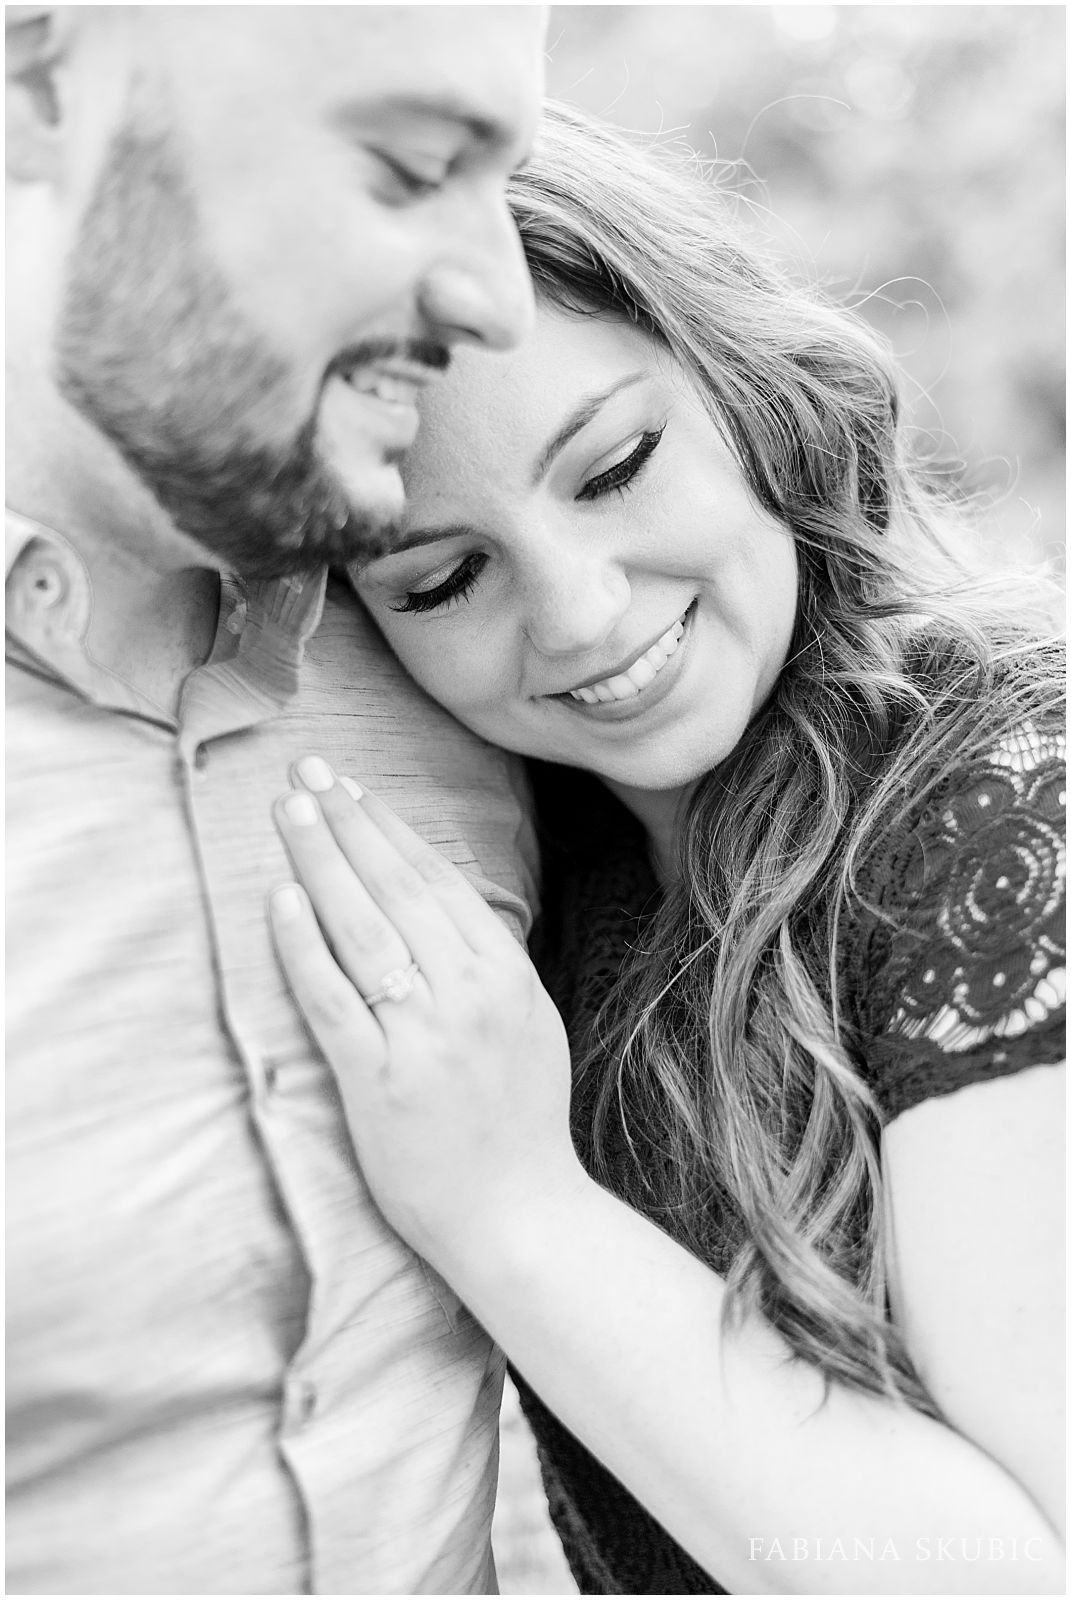 best-engagement-photos-wedding-photographer-nc-nj (37).jpg